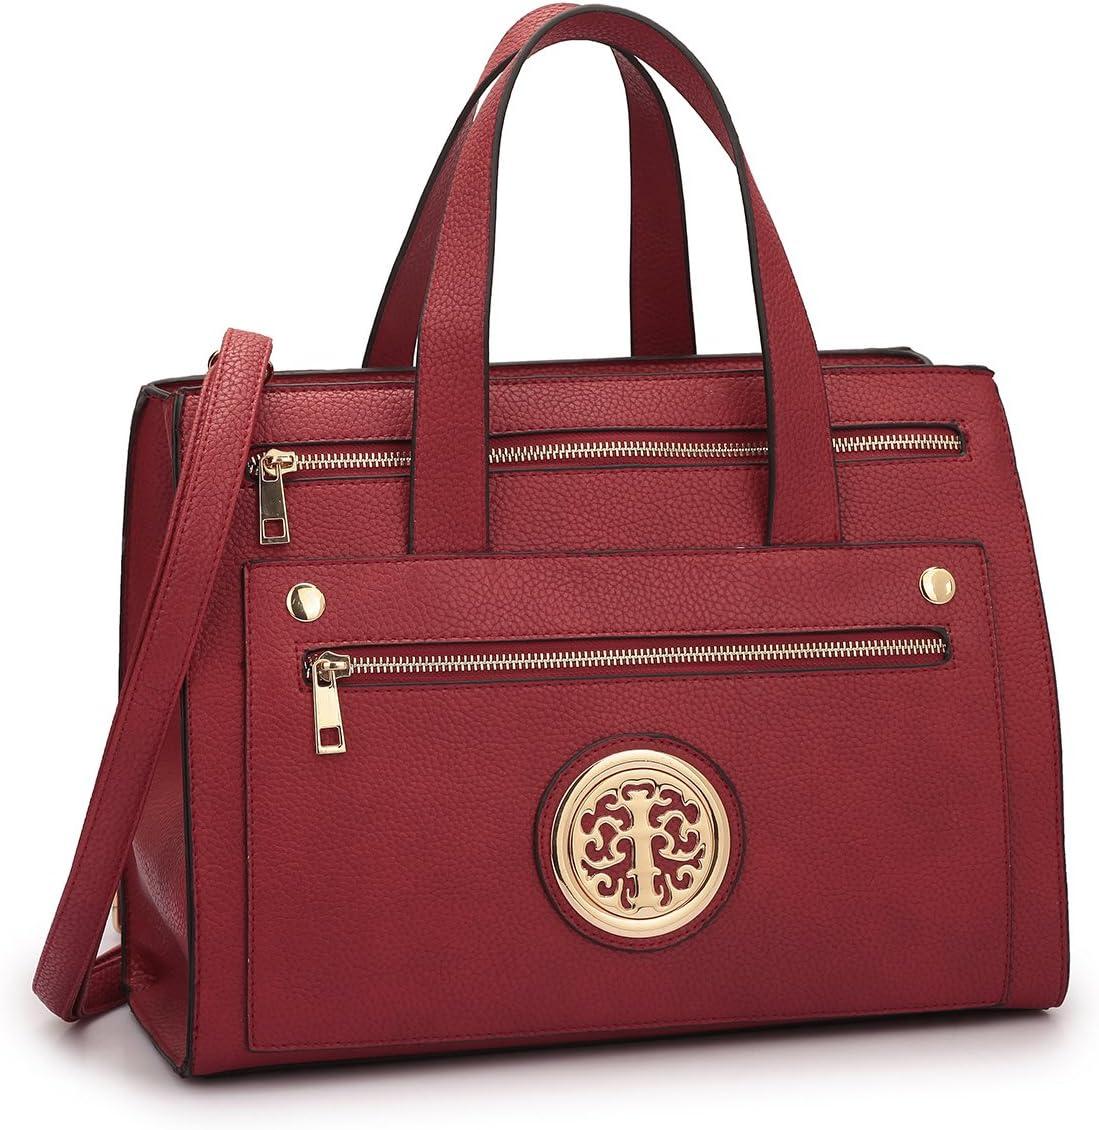 Fashion Women Top Handle Handbags Satchel Purse Hobo Tote Shoulder Bag 7042-RD